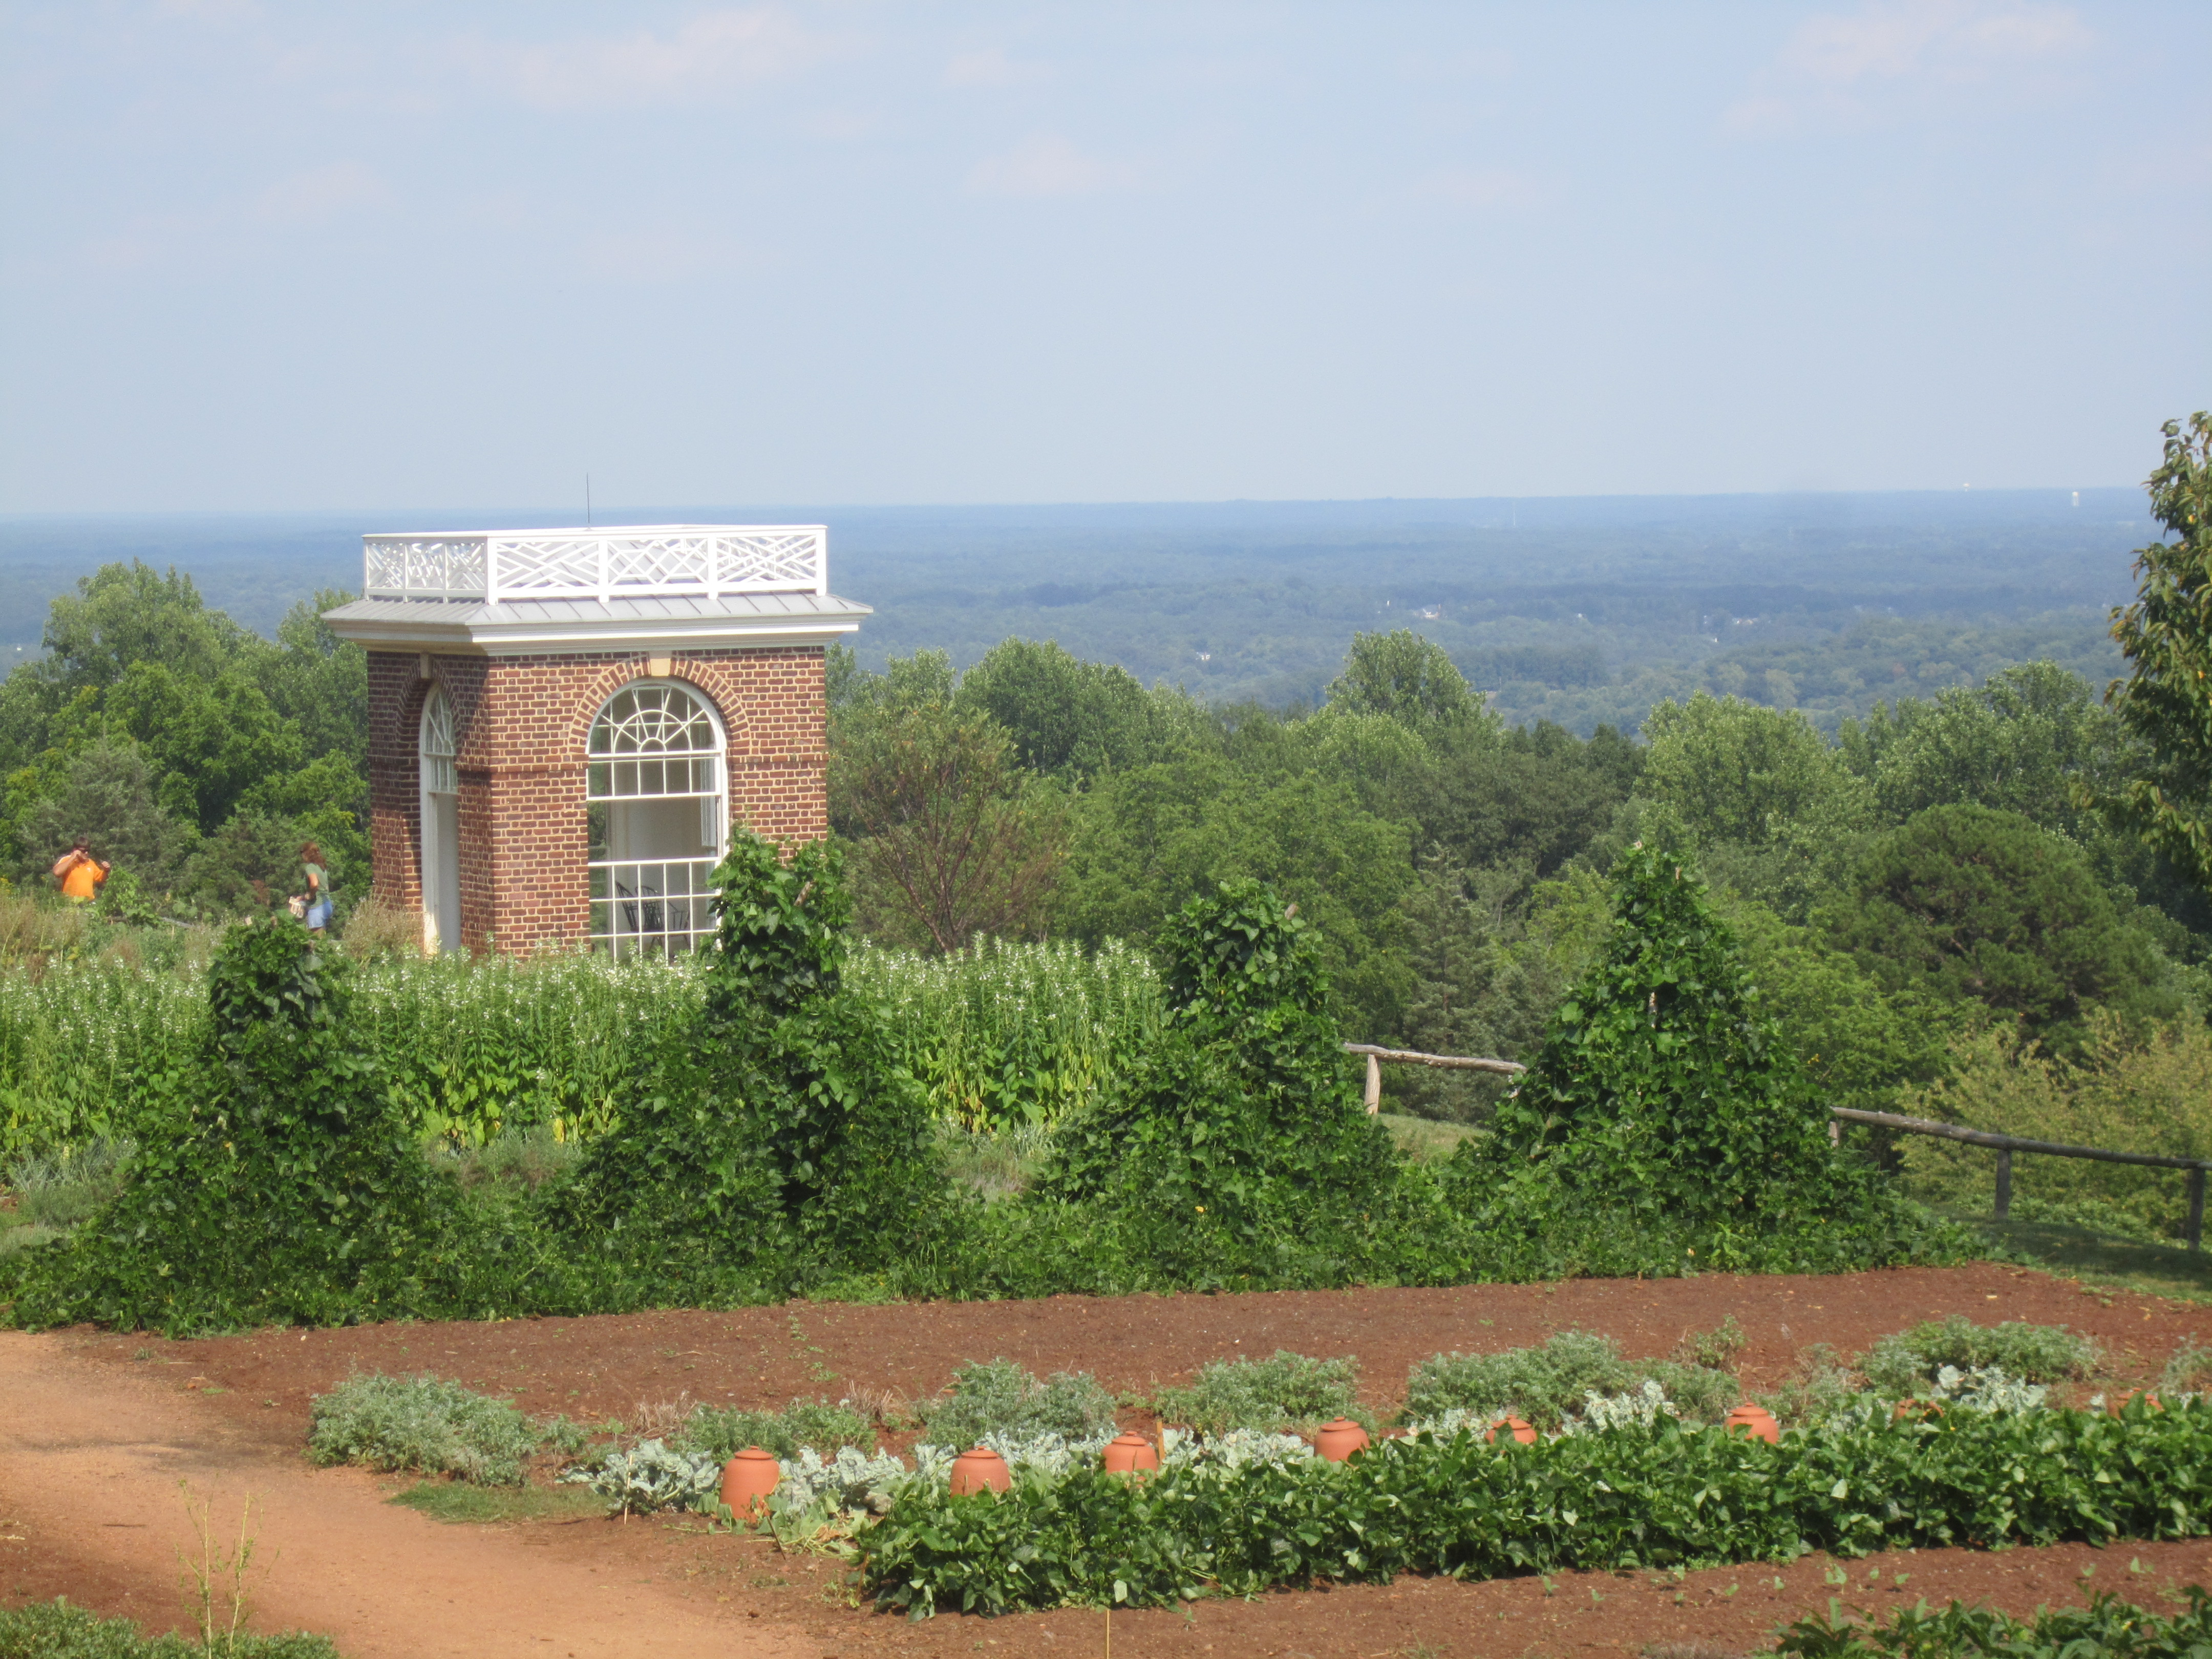 Thomas Jefferson's Legacy at UVa